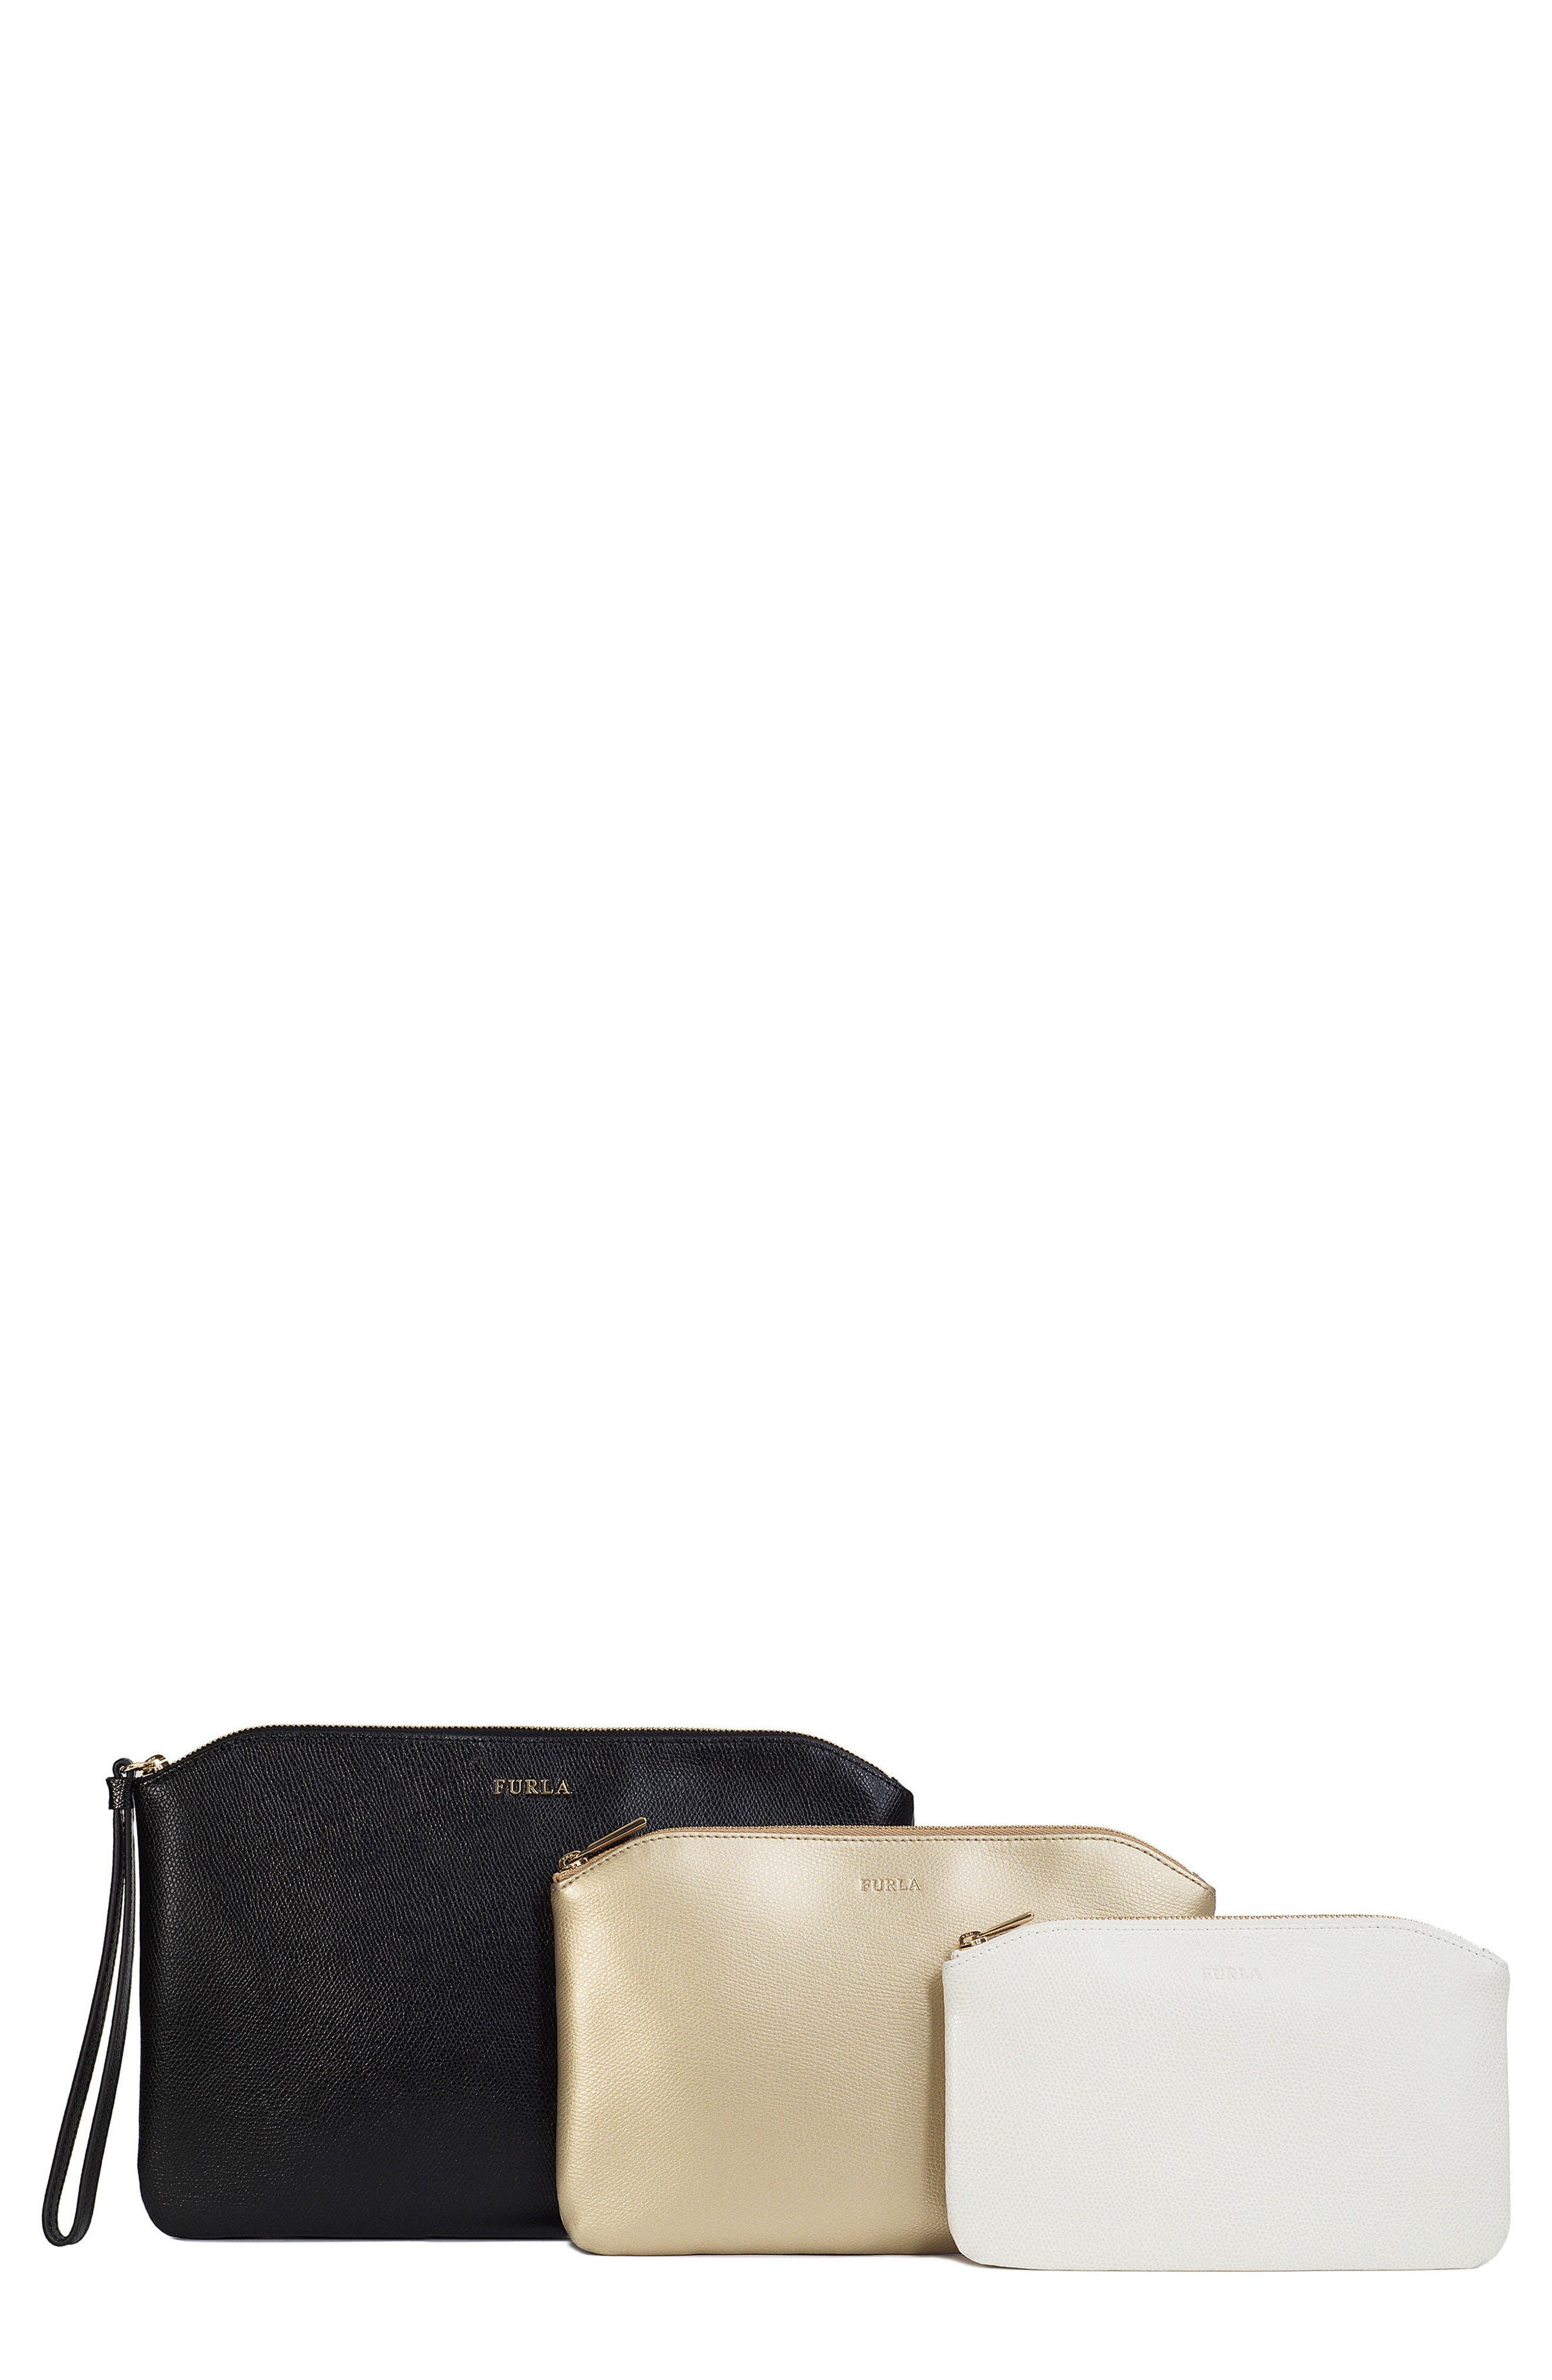 Venere Set of 3 Leather Cosmetic Bags,                         Main,                         color, Onyx/ Gold/ Petalo